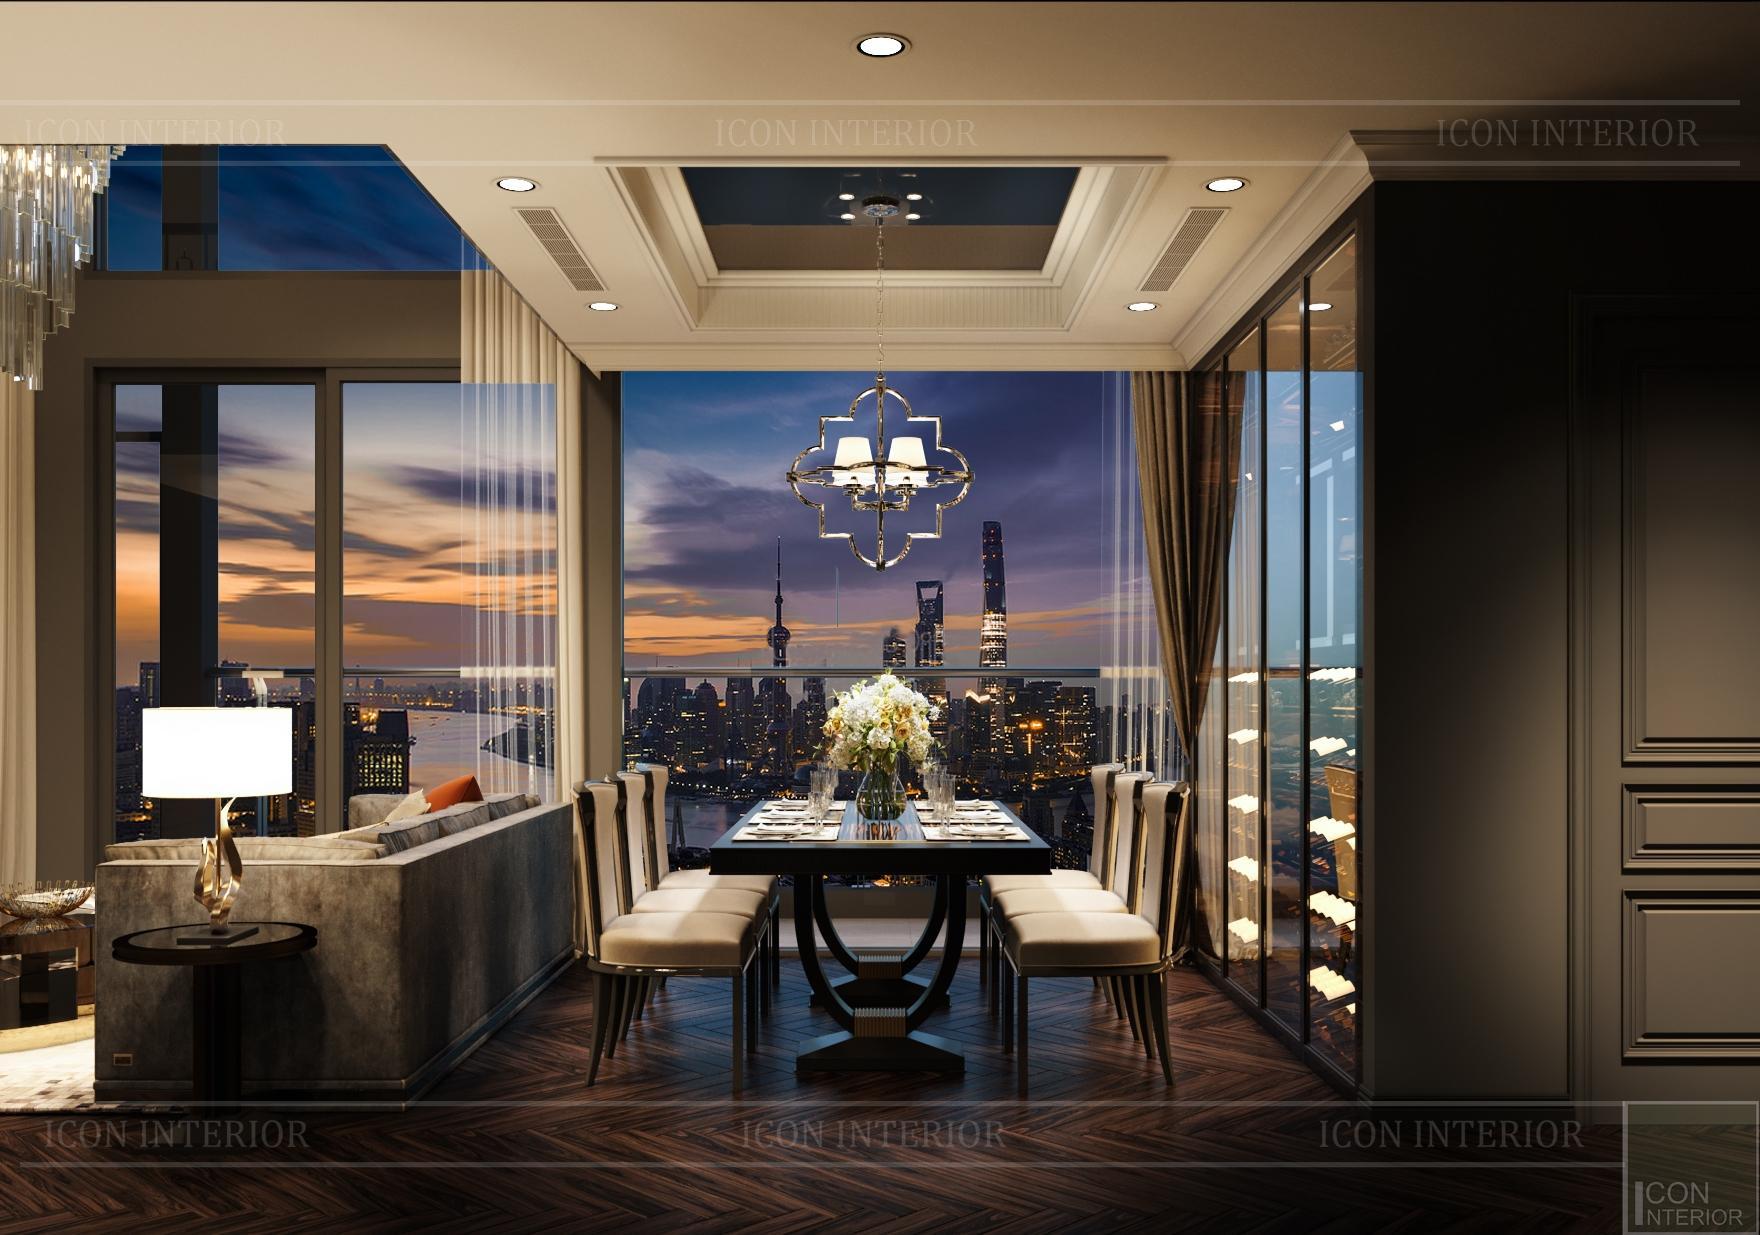 penthouse kingdom 101 - bàn ghế ăn